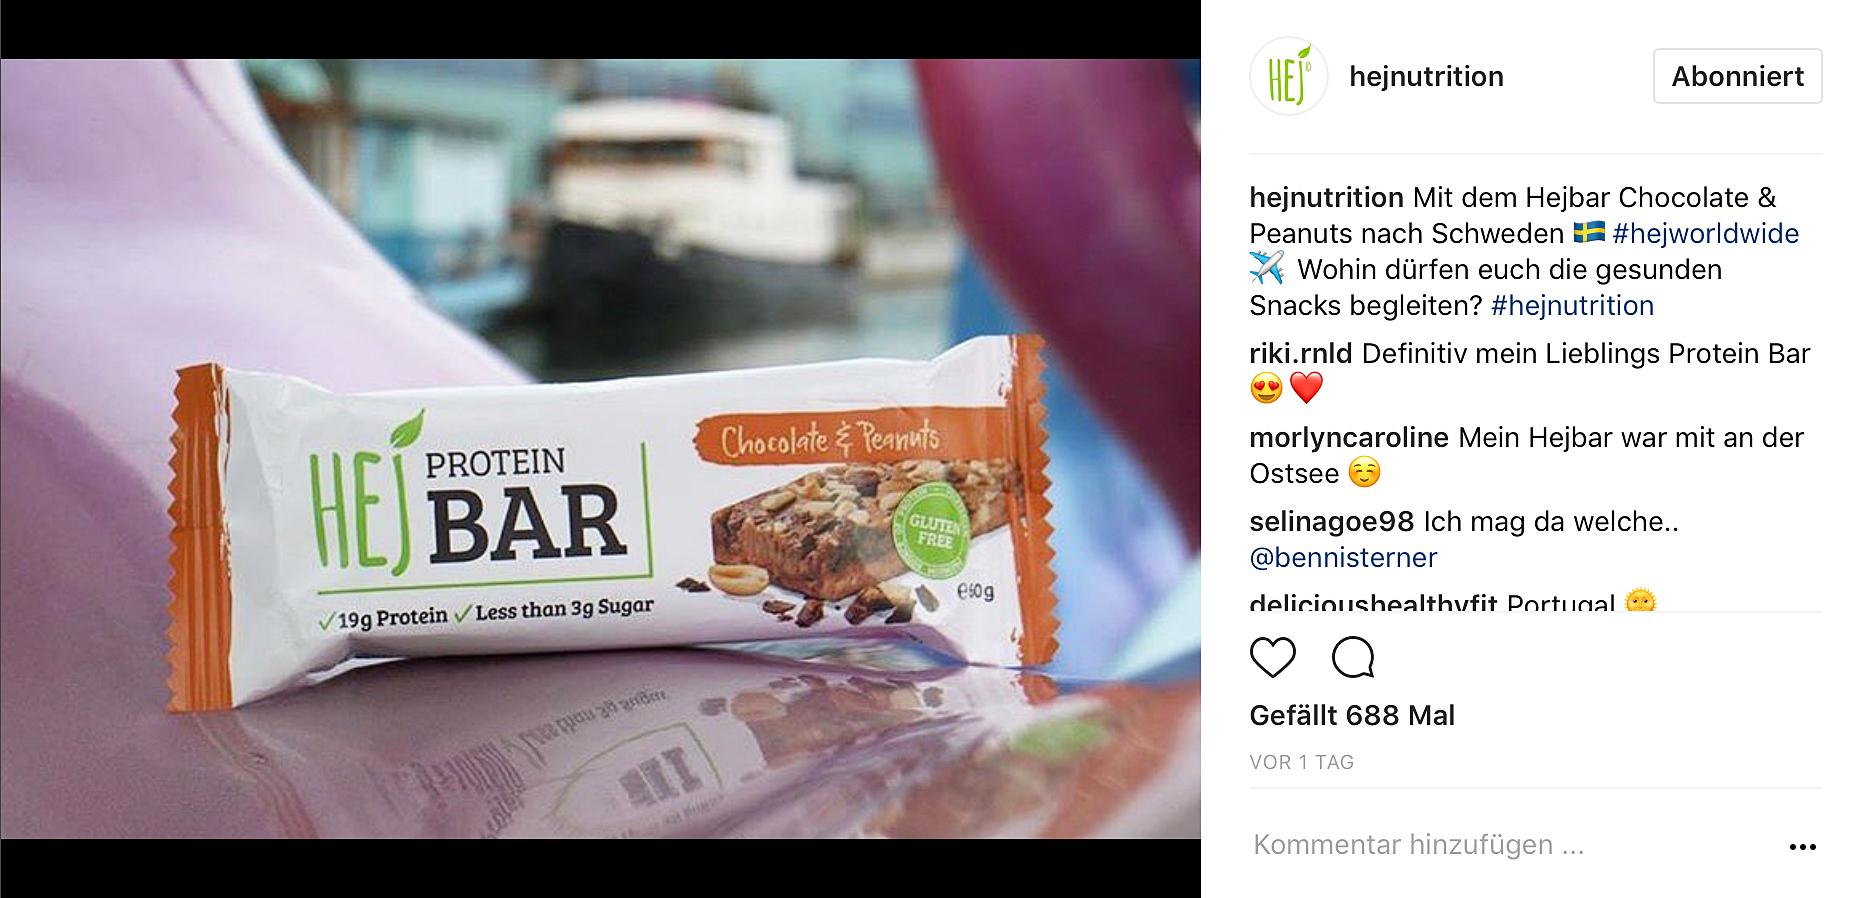 HEJ_Instagram_Malmoe_Schweden_Chocolate&Peanuts_01.08.2017.jpg